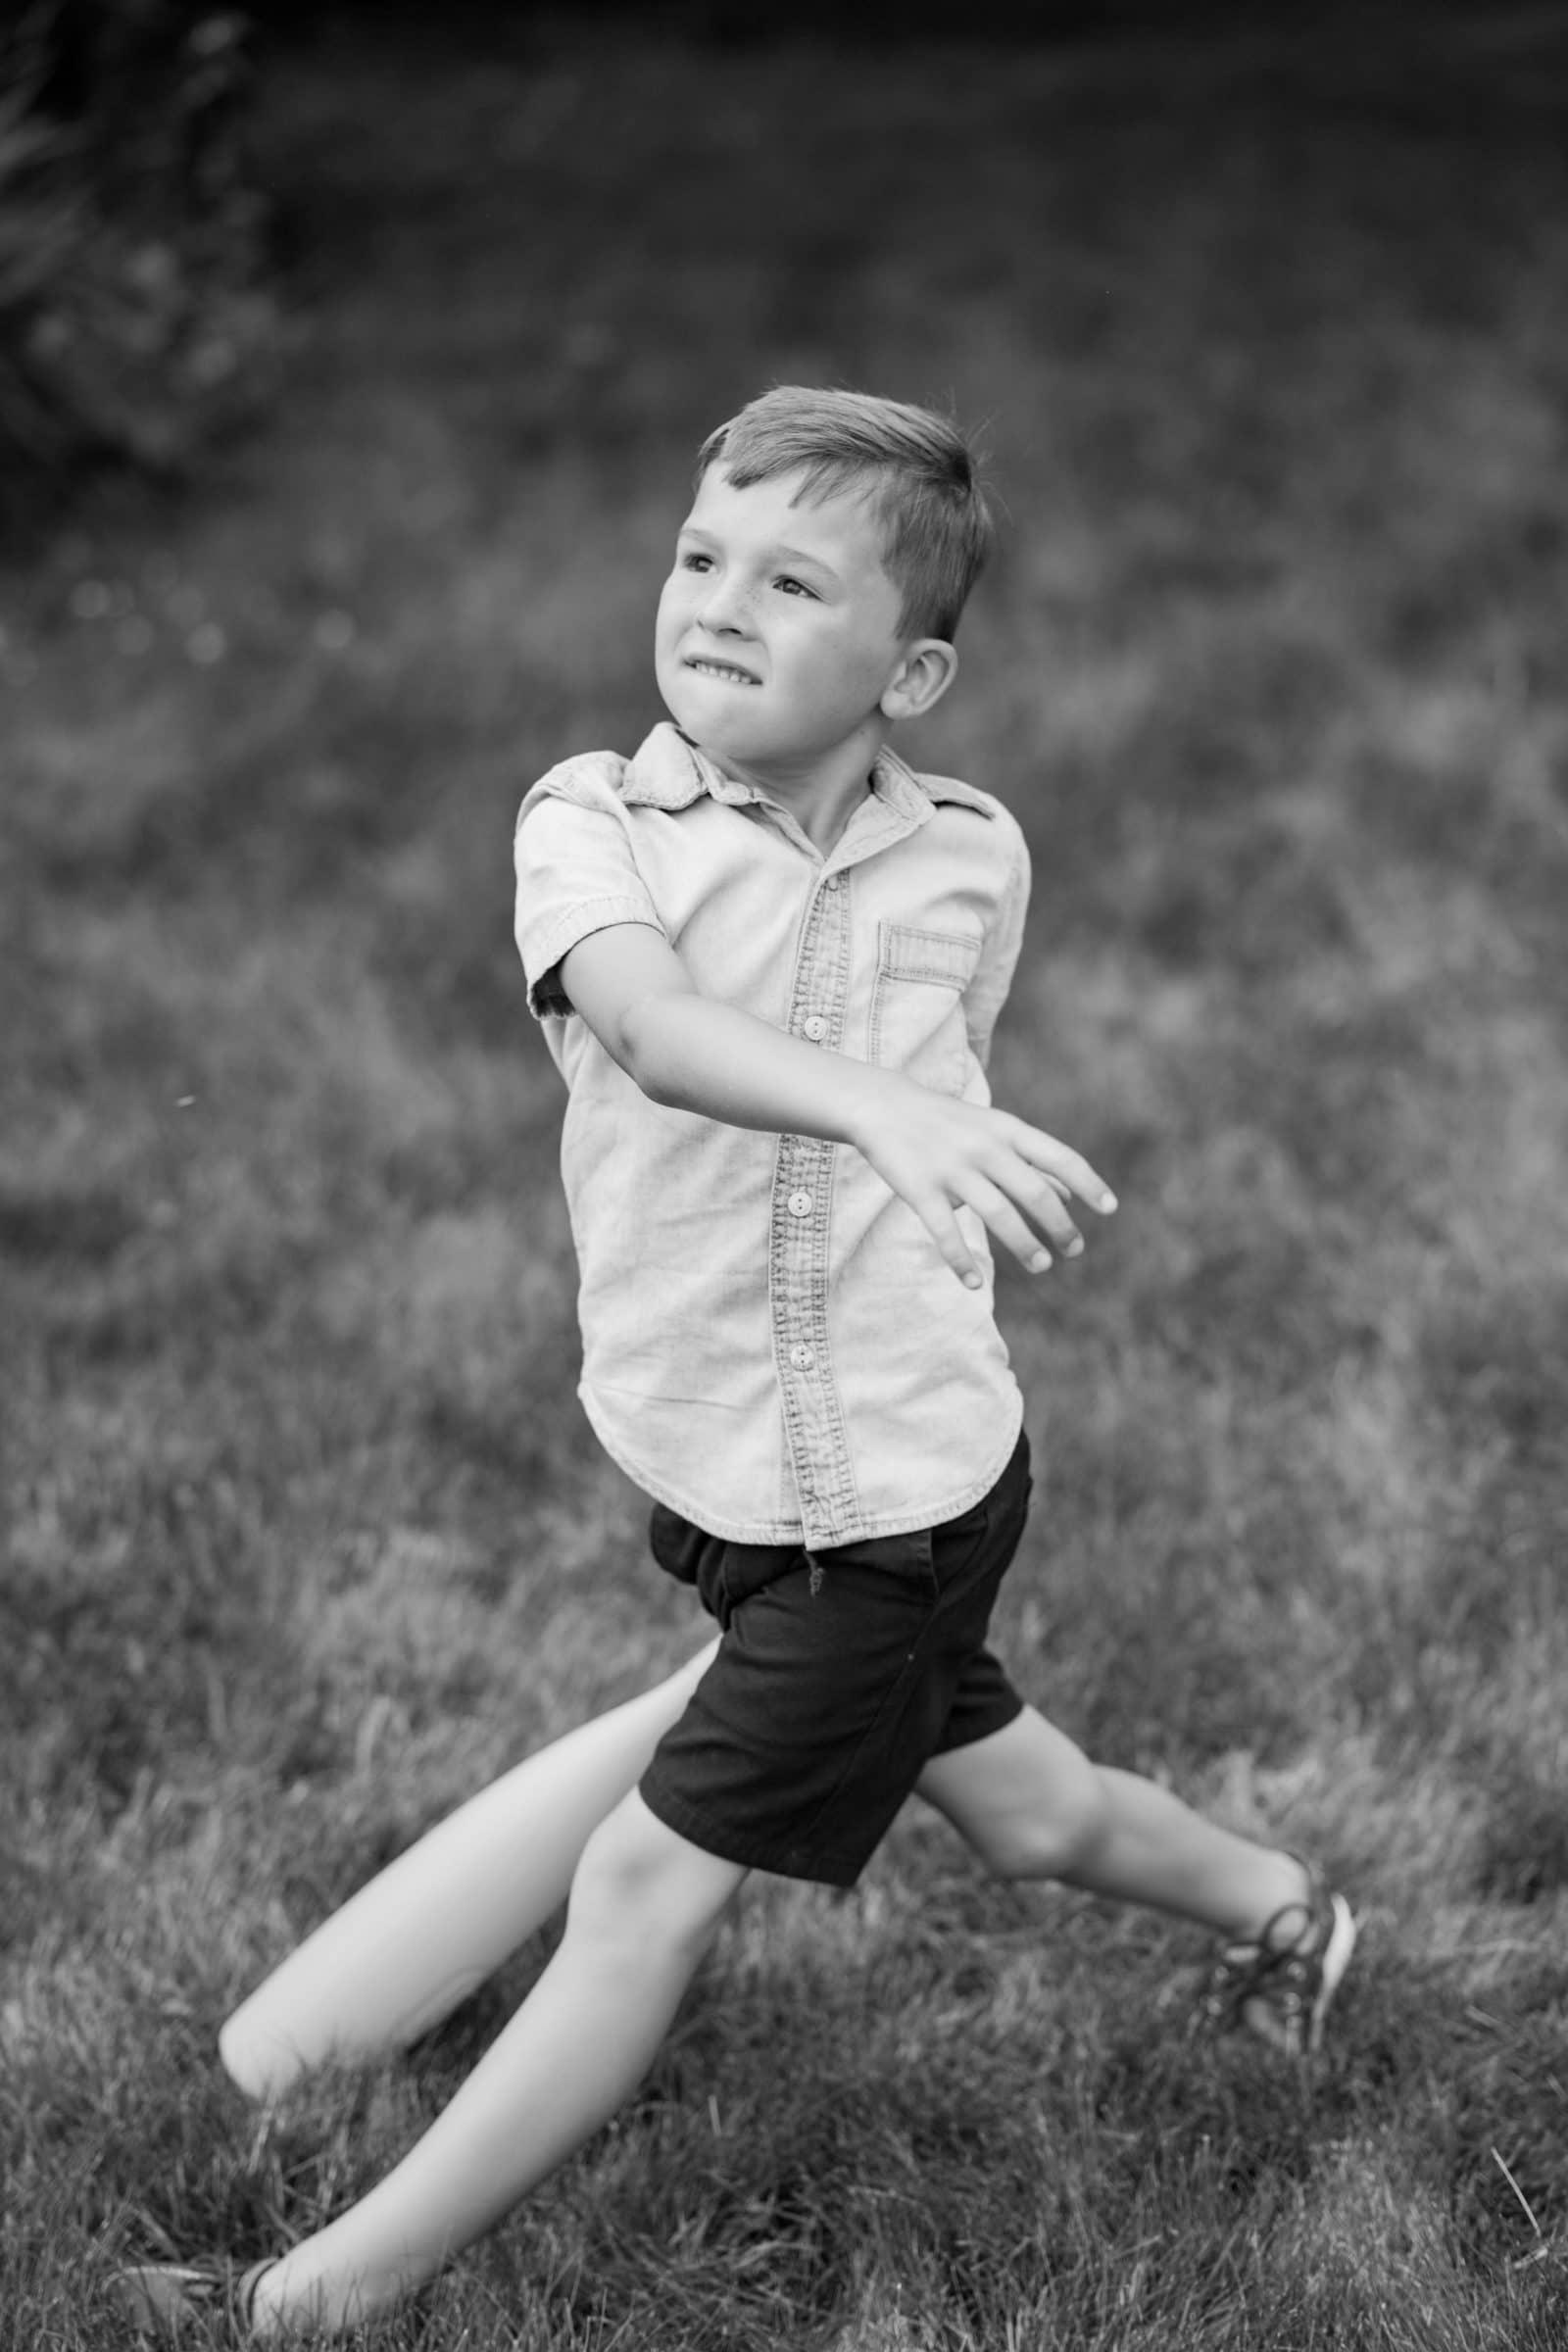 small boy with baseball bat